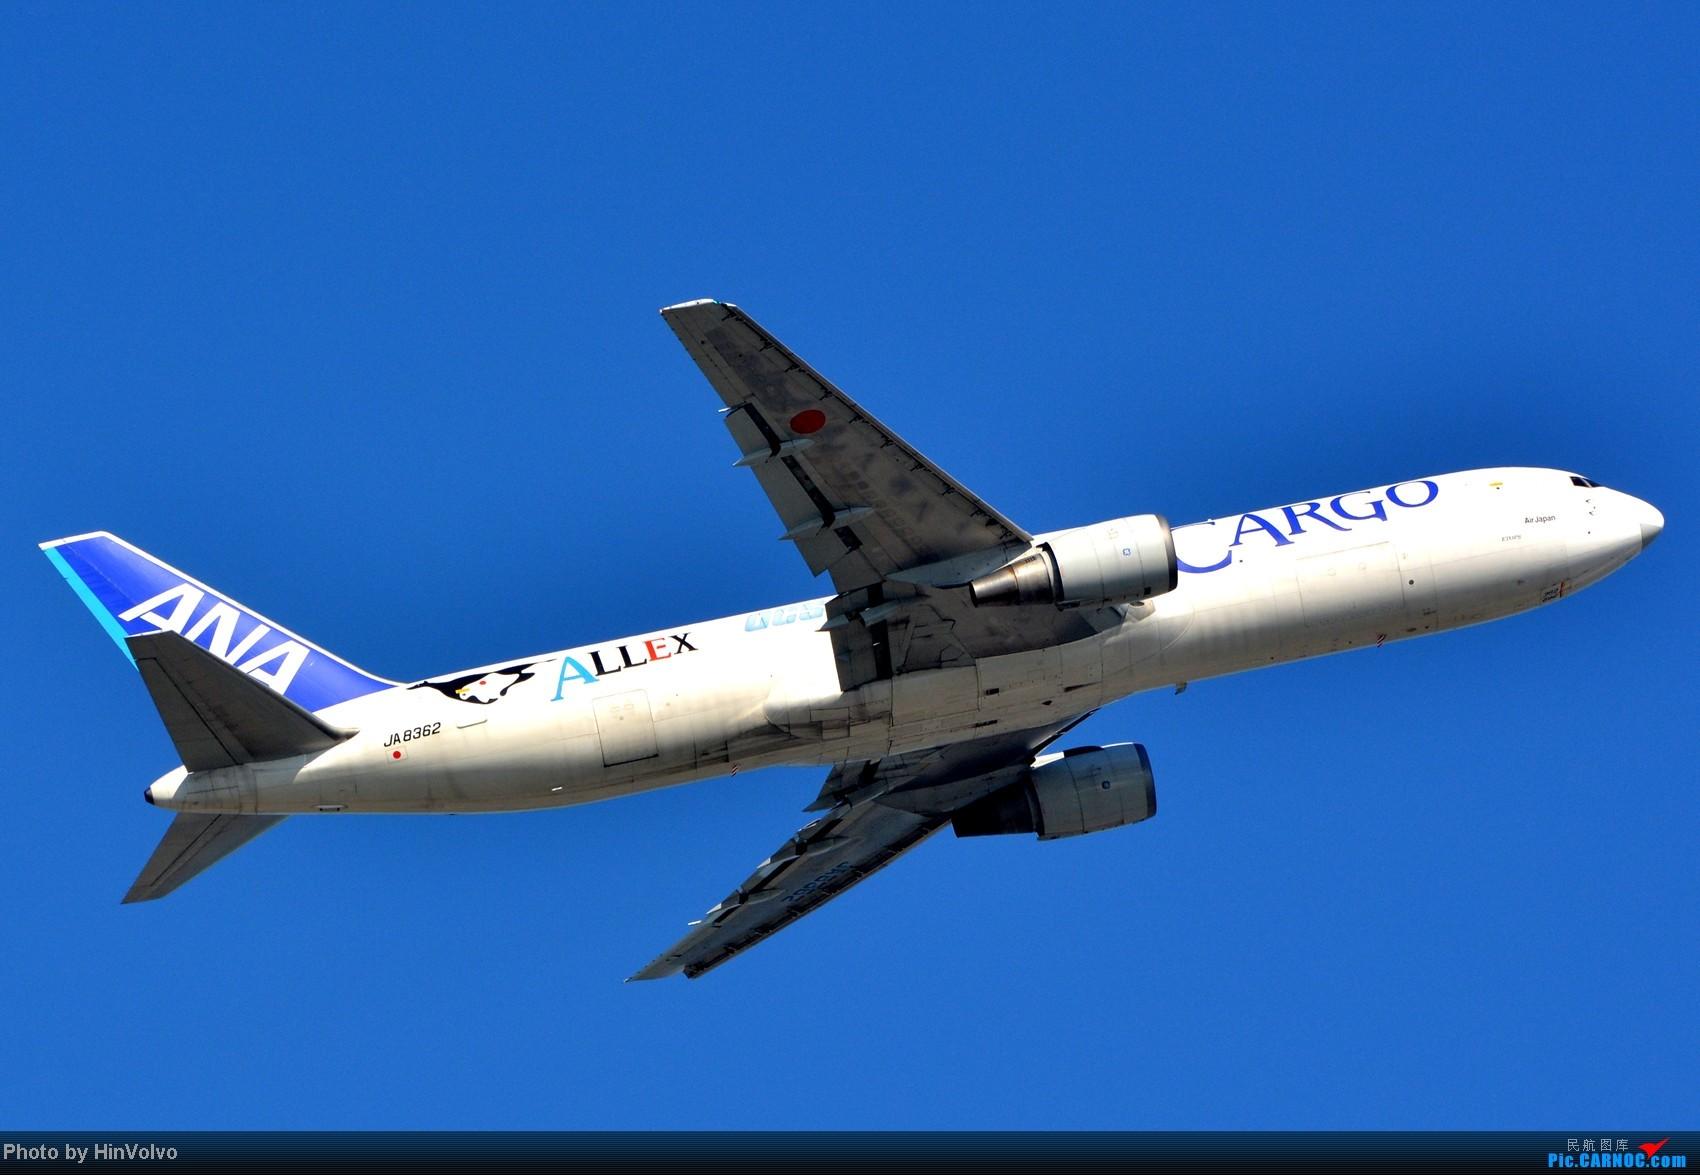 Re:[原创]~~~~多圖系列~~~HKG,早上好!寒冷的天氣出發前往機場拍到中午。 BOEING 767-200 JA8362 中国香港赤鱲角机场